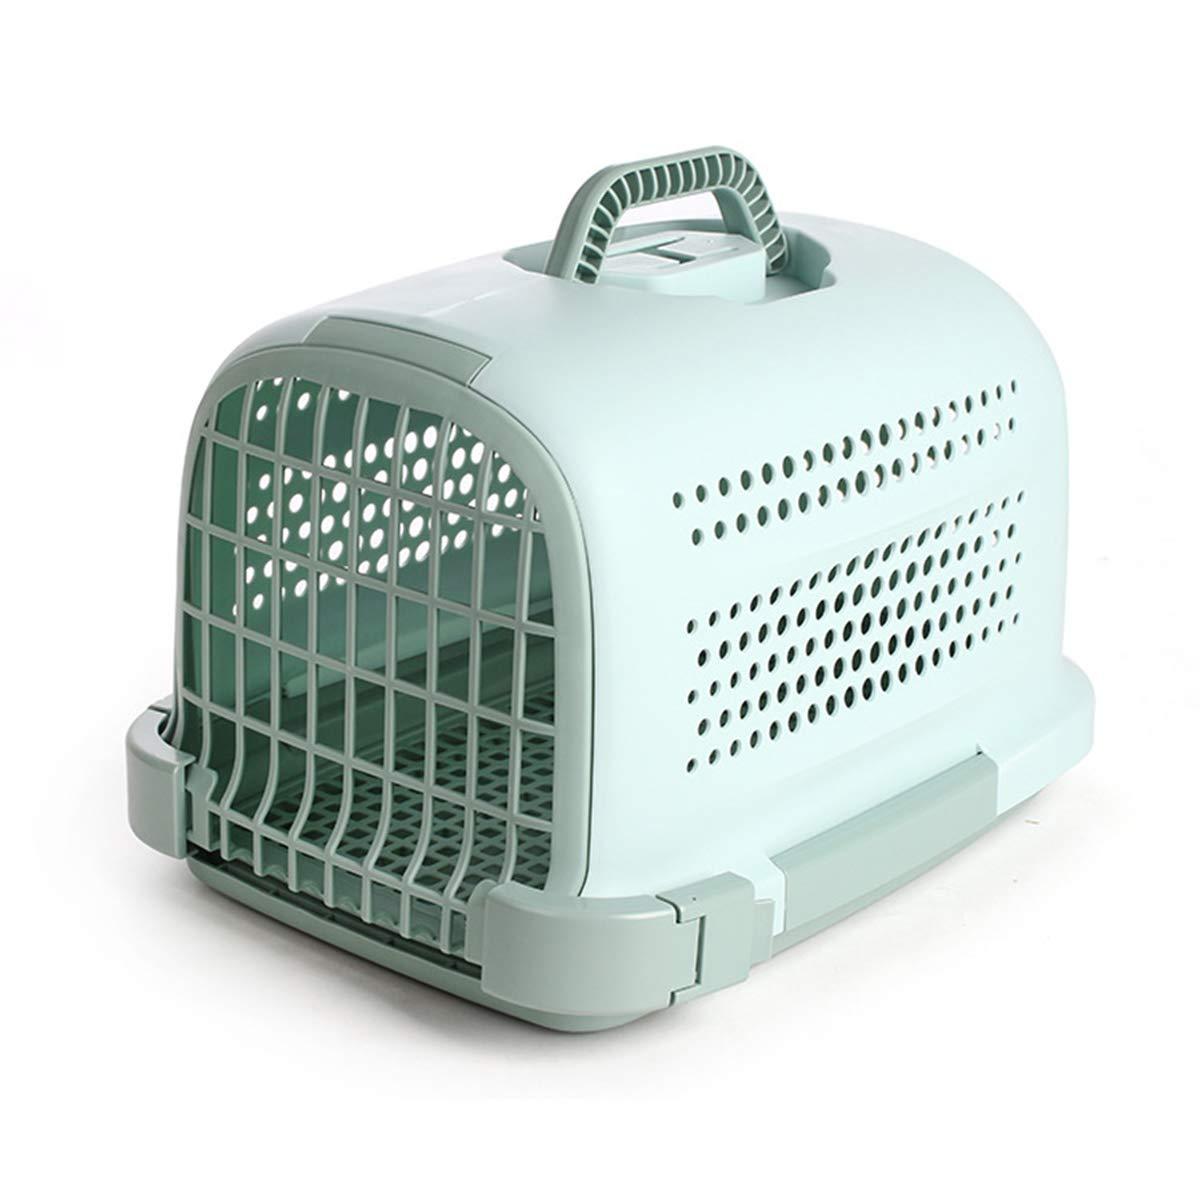 Green 483429cmHWX Premium Plastic Pet Carrier, Kitten Cat Dog Animal Portable Transport Travel Box Cage,brown,48  34  29cm